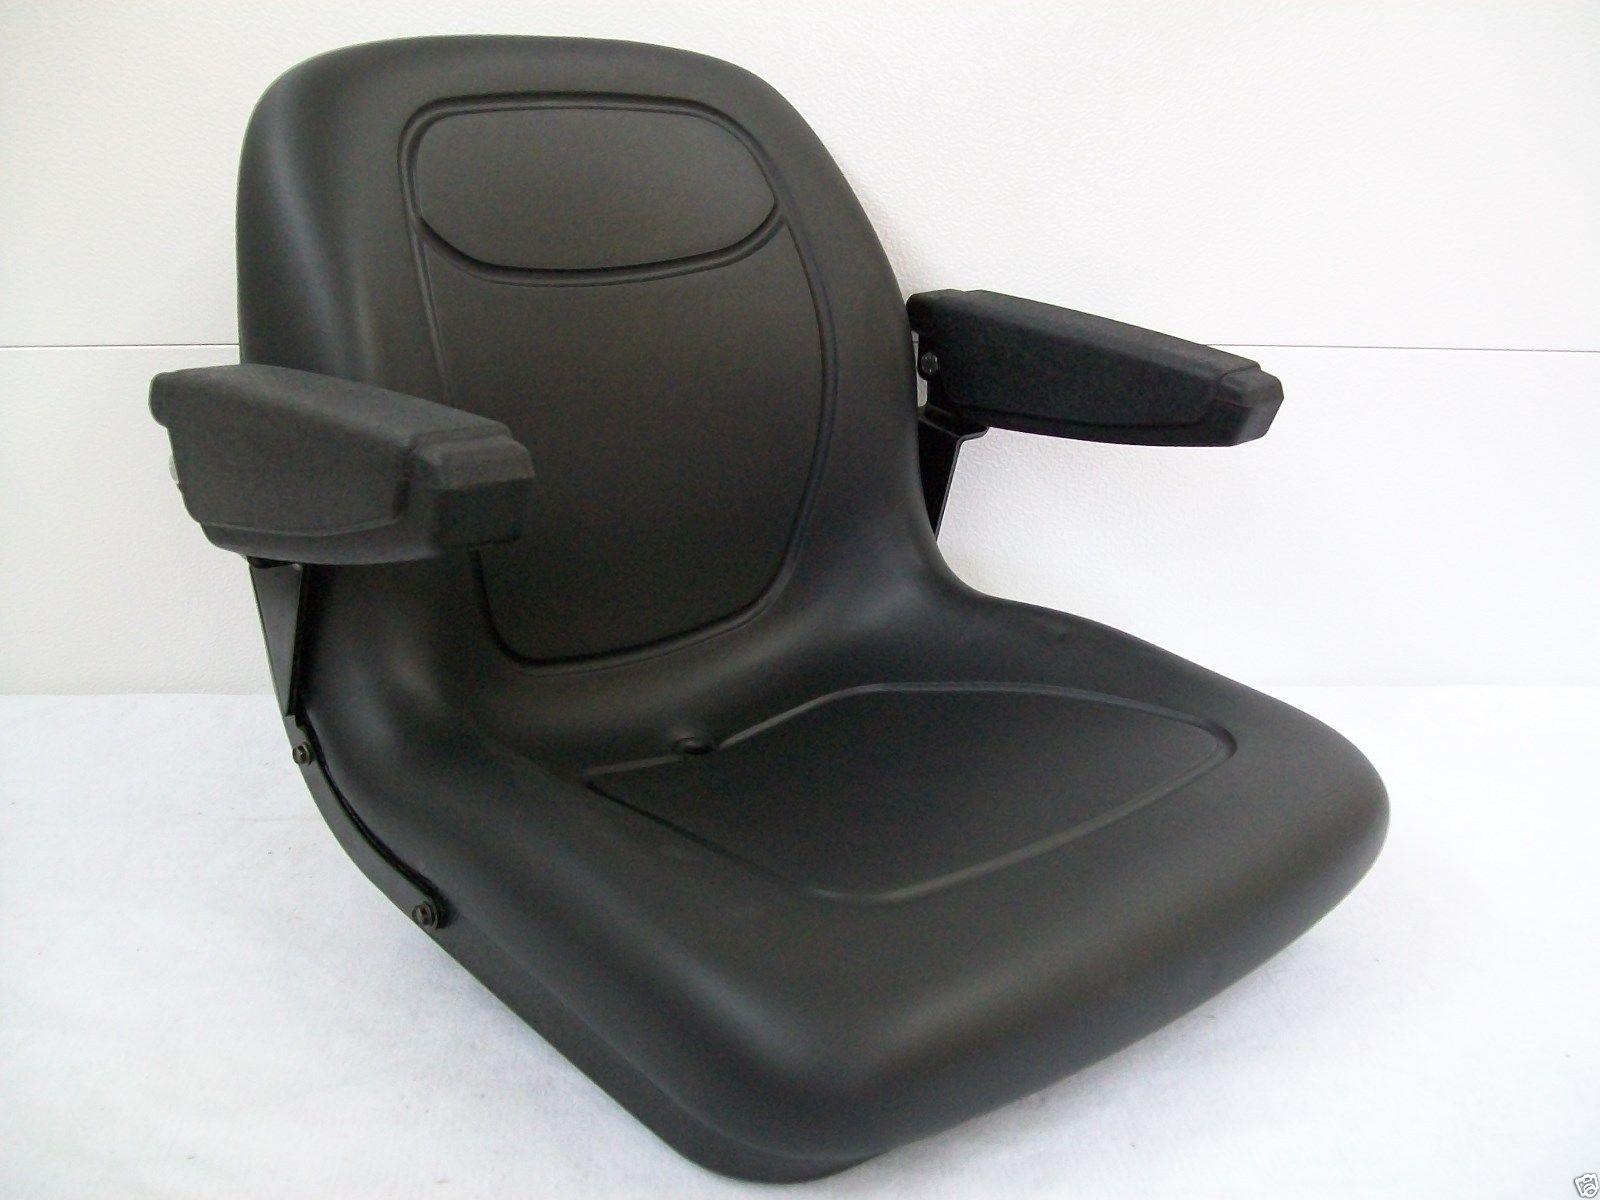 Black Seat Cub Cadet Z Force 44 48 50 54 60 Zero Turn